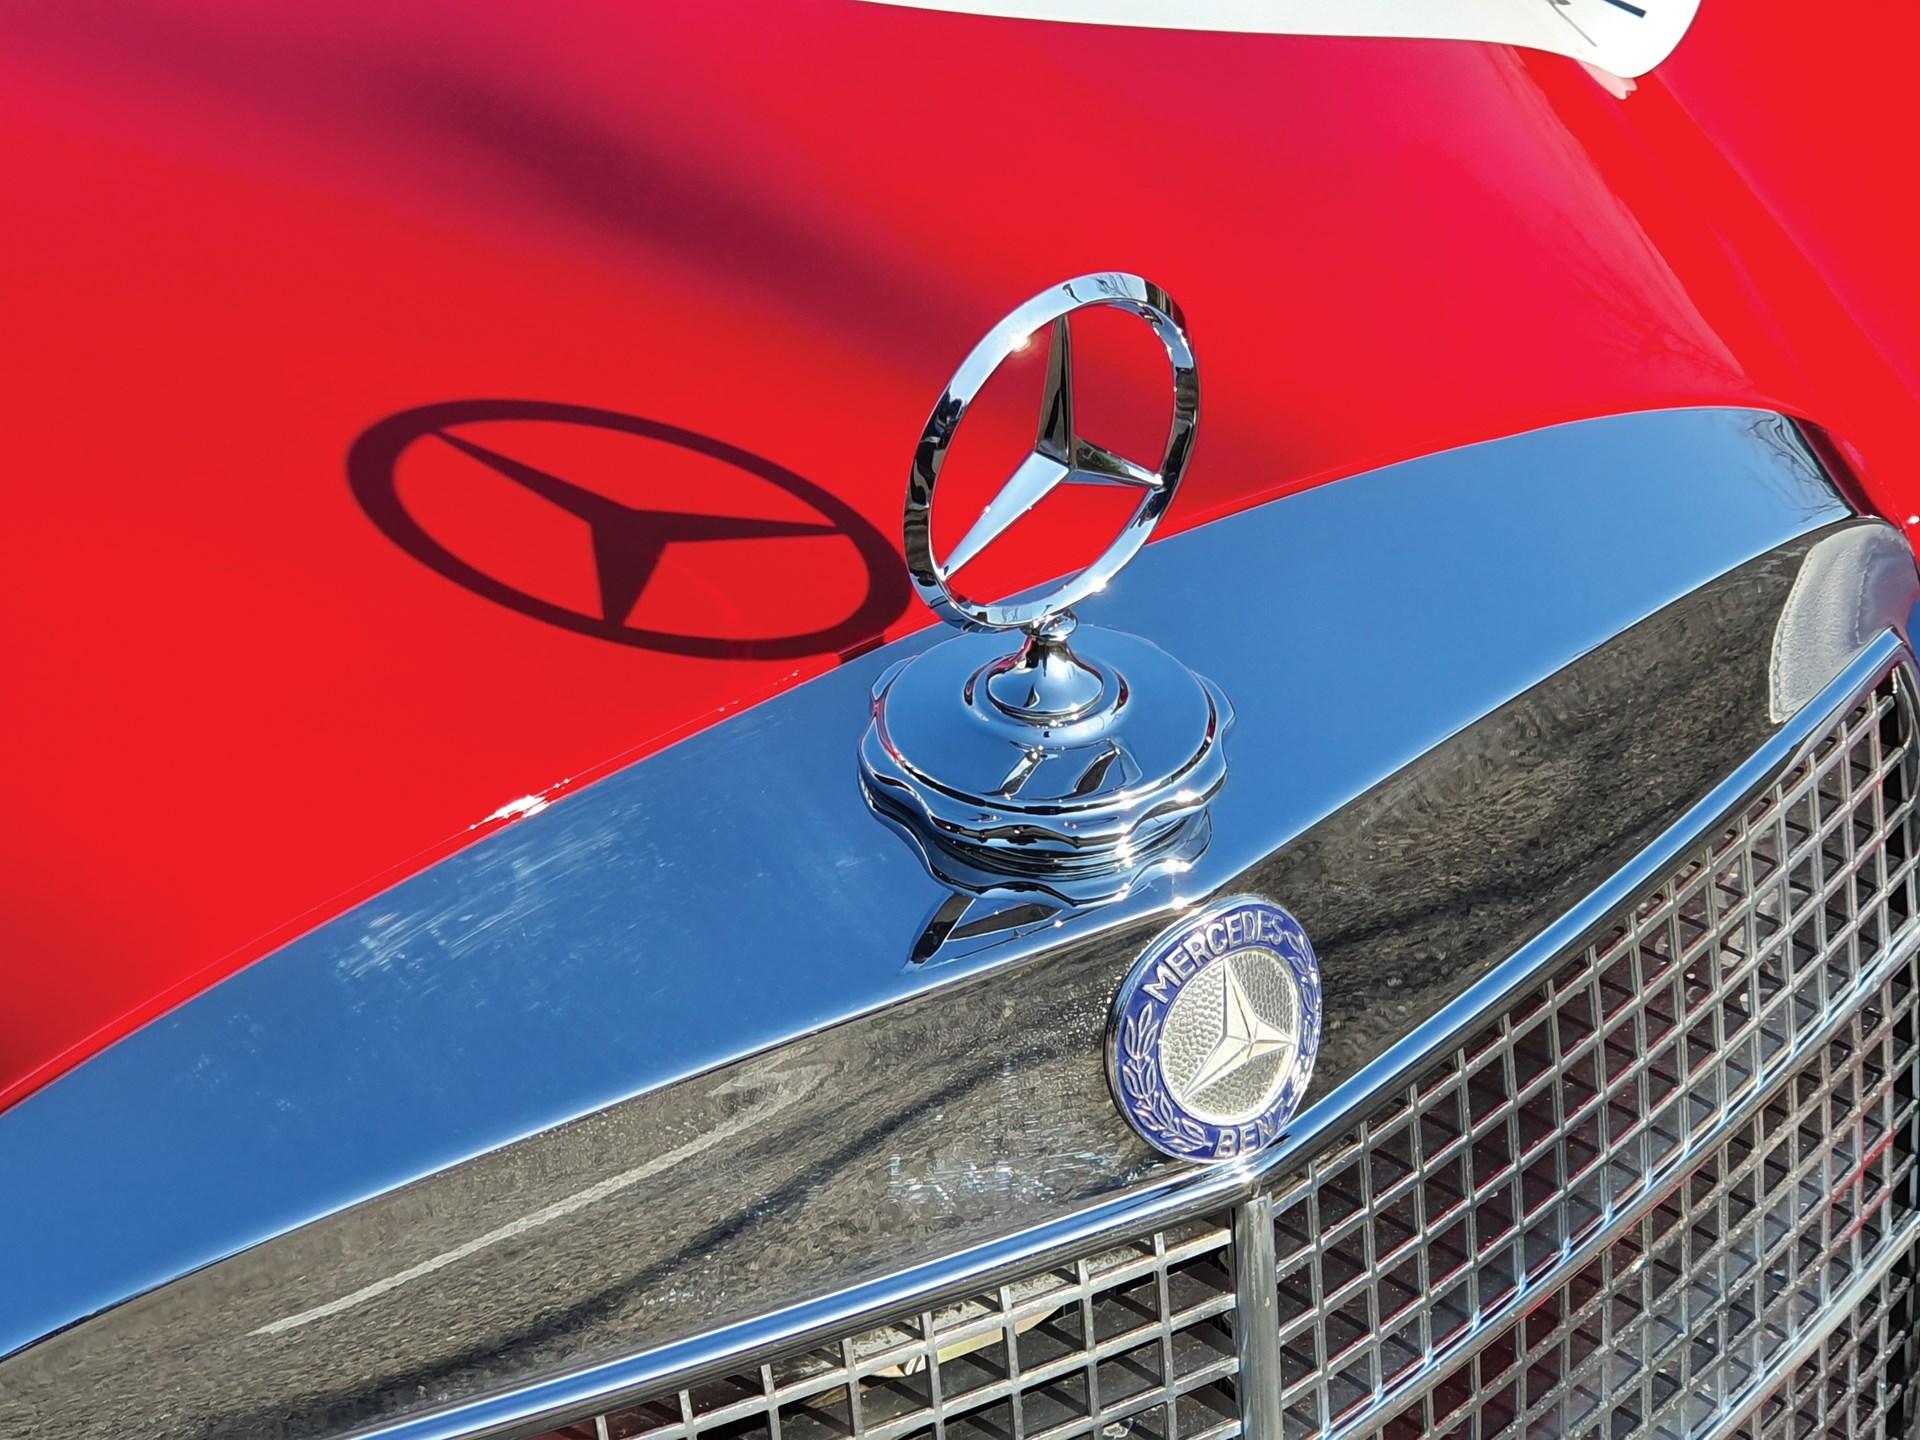 Mercedes-Benz 300 SEL 6.3 Red Pig Replica asta